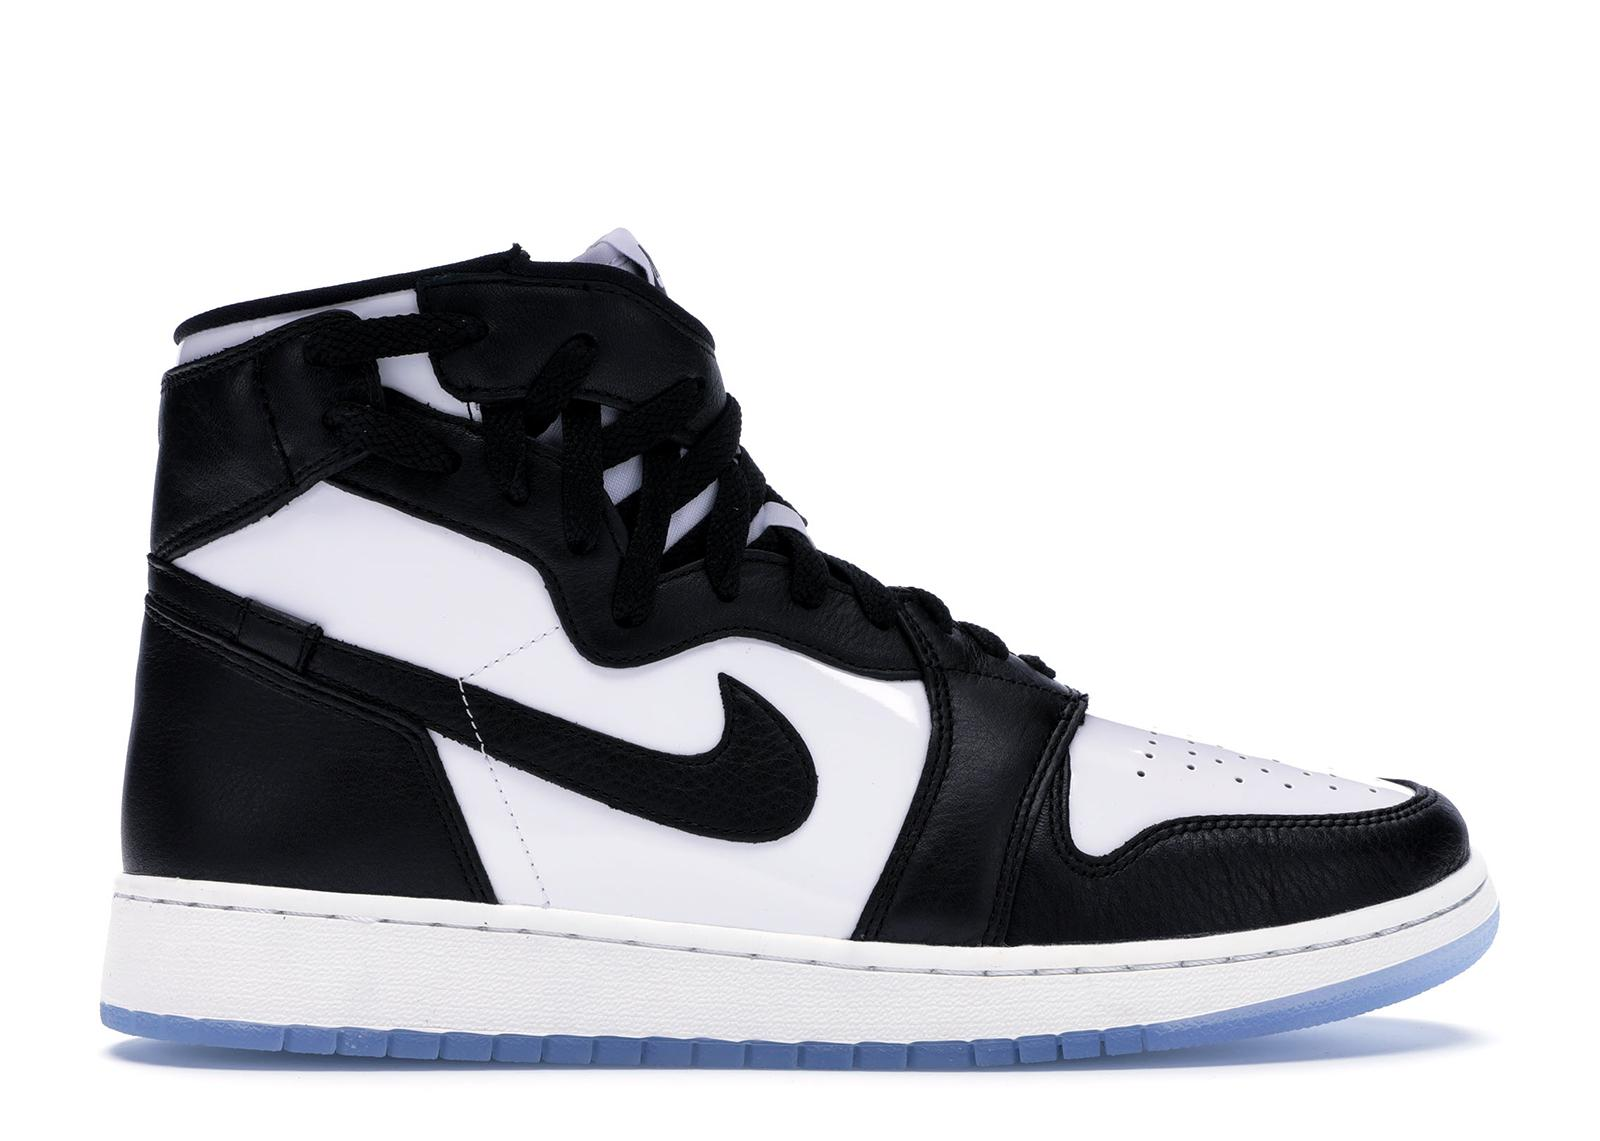 Lyst - Nike Air Jordan 1 Rebel Xx High Top Sneaker in Black - Save 7% d75f1bdcc